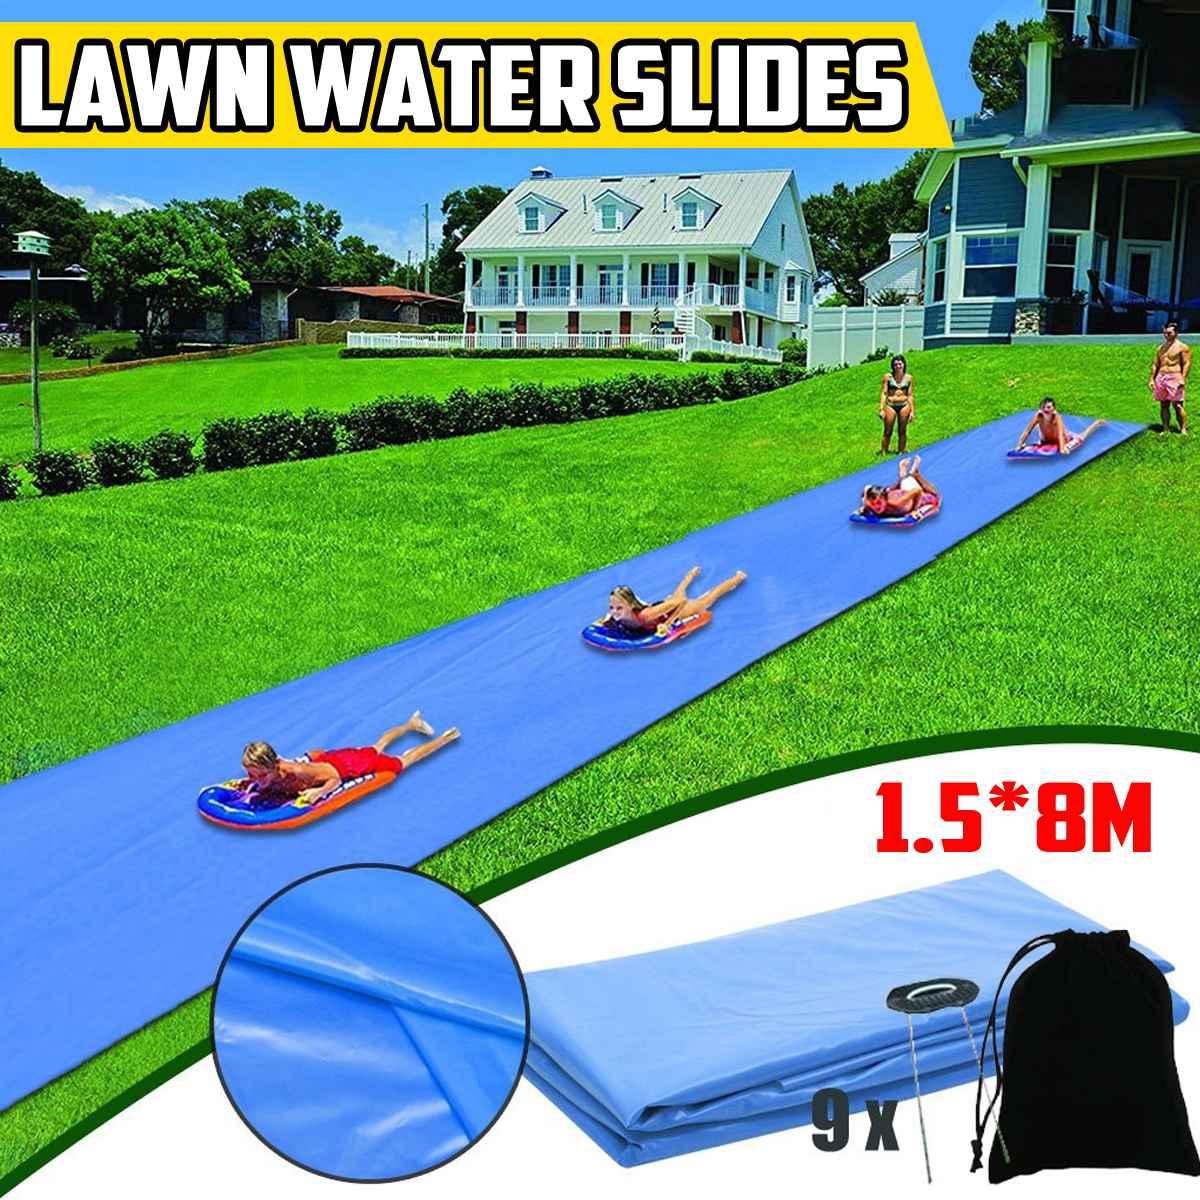 8M Surf Water Slide Mat Lawn Water Slide For Children Summer Pool Games Toys Backyard Outdoor Water Skater